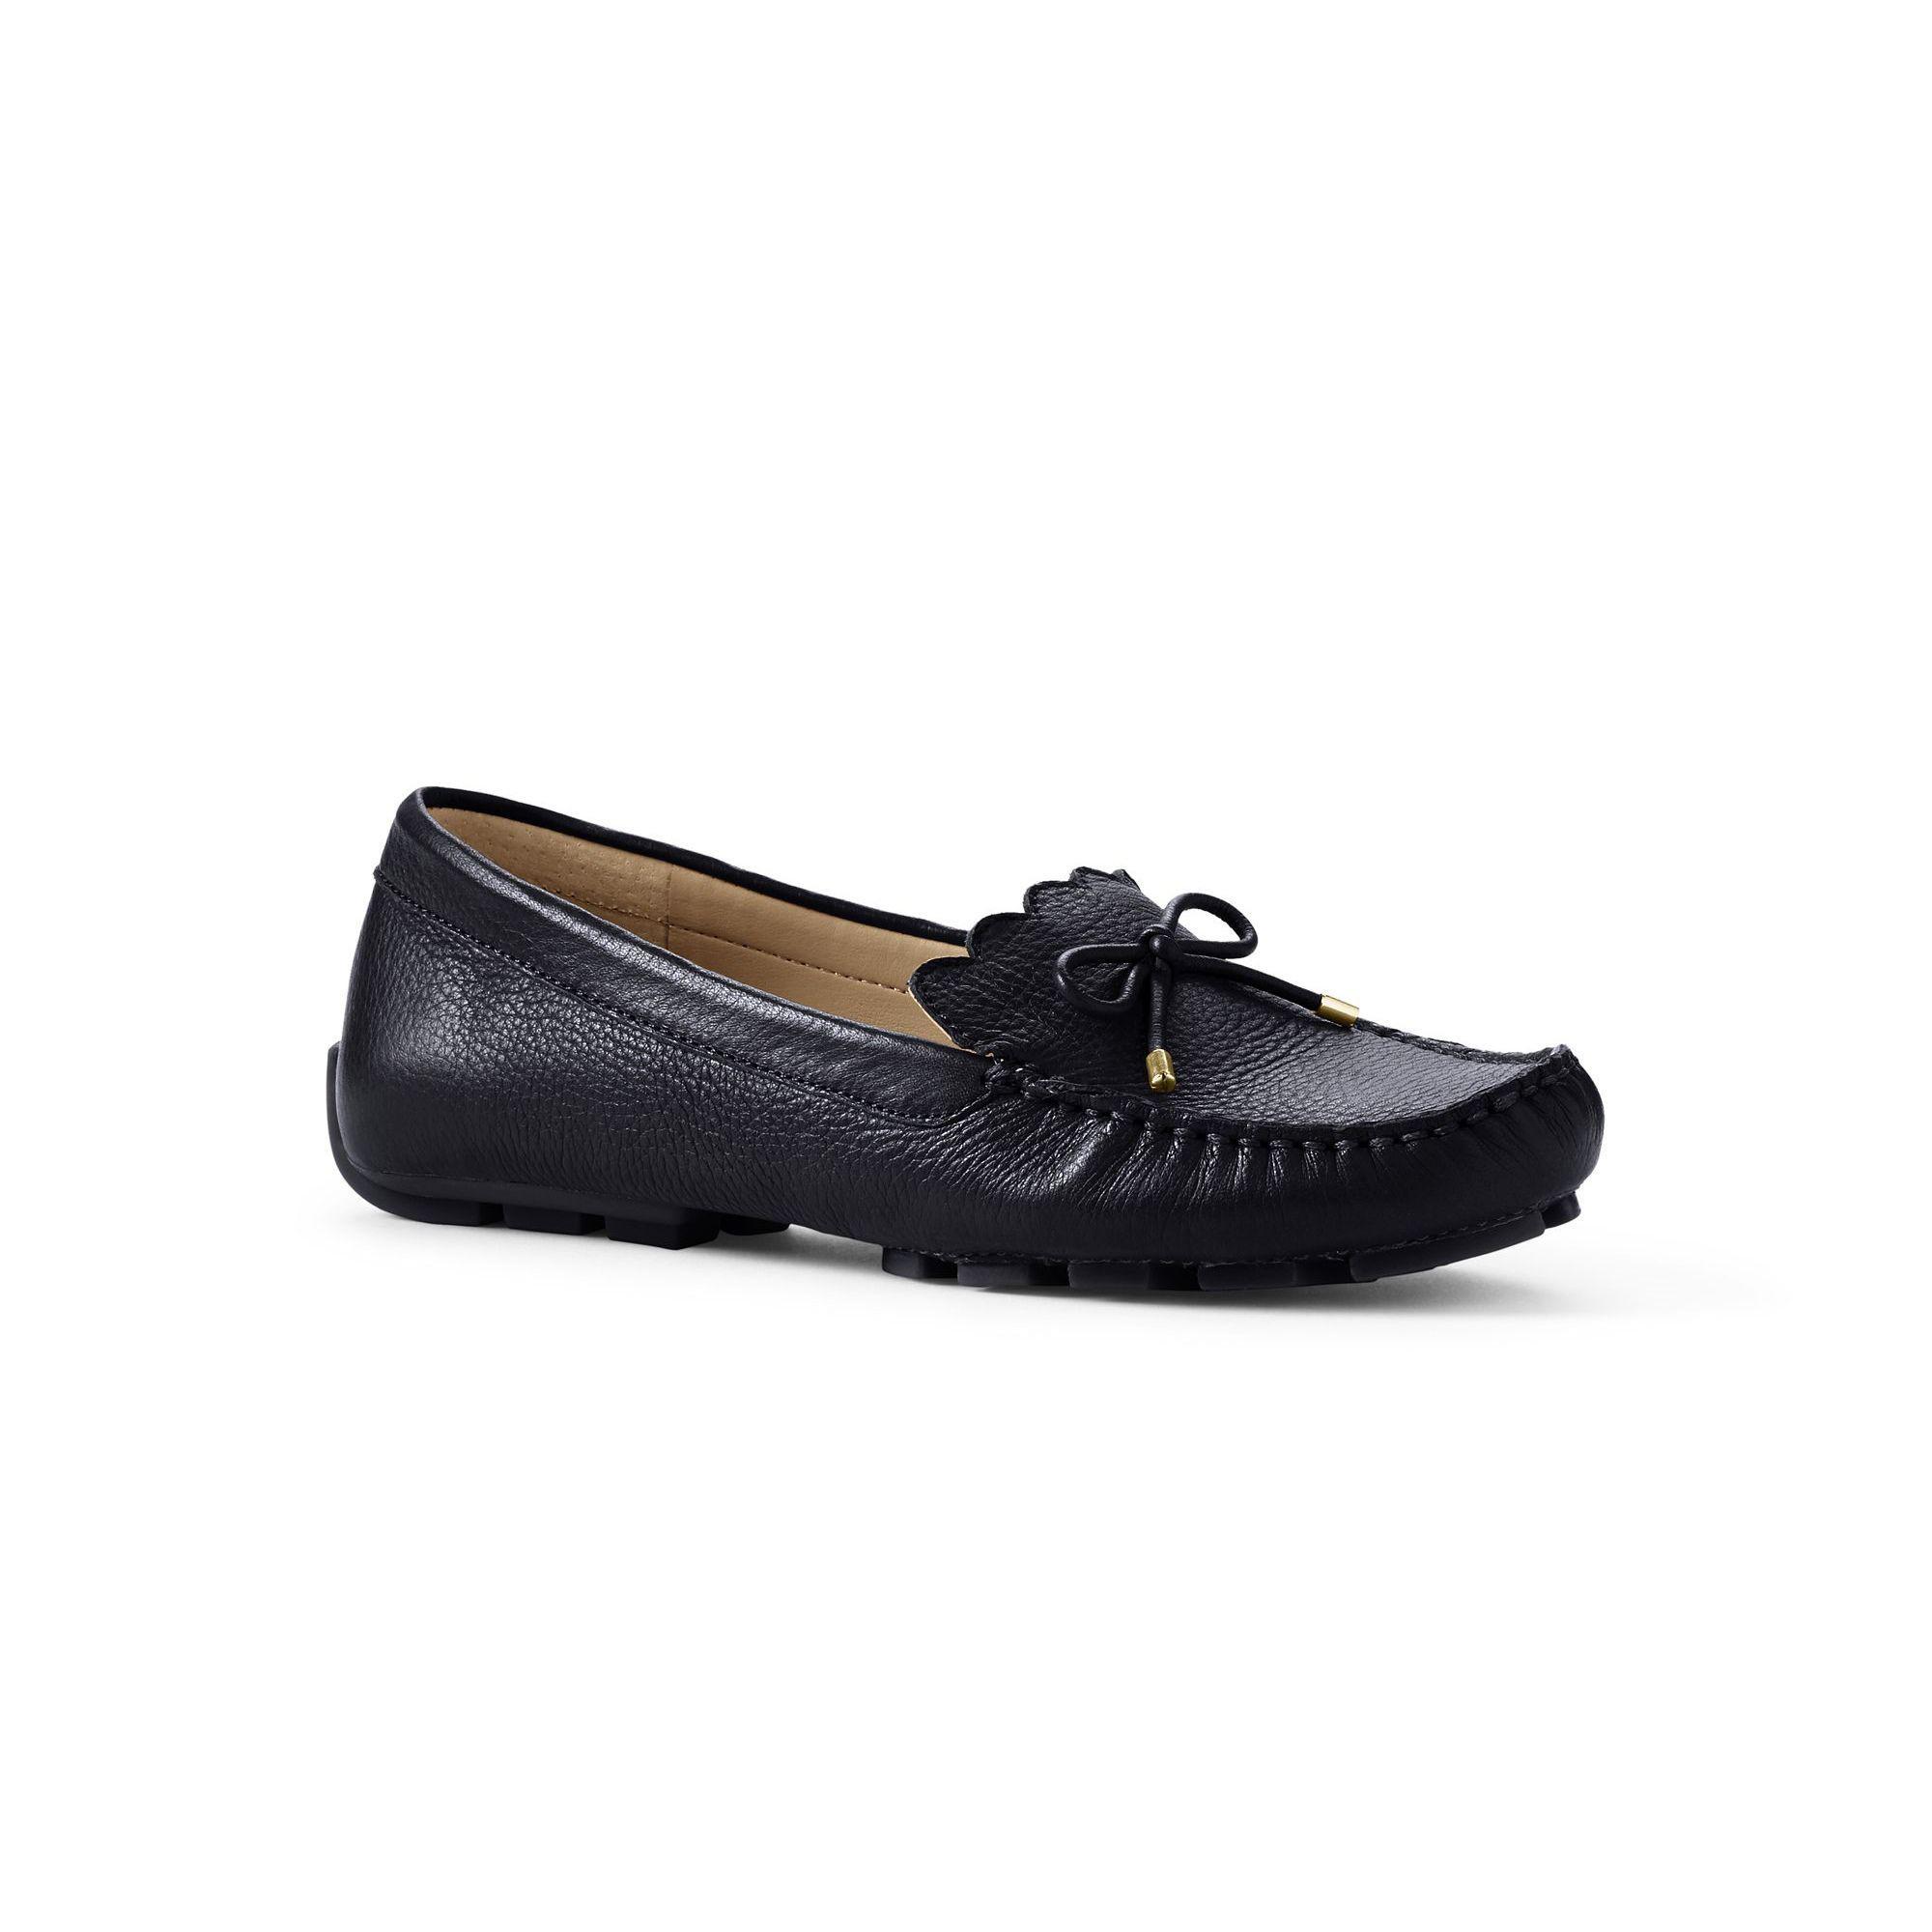 546576fde59f Lands' End Black Regular Scalloped Driving Shoes in Black - Lyst